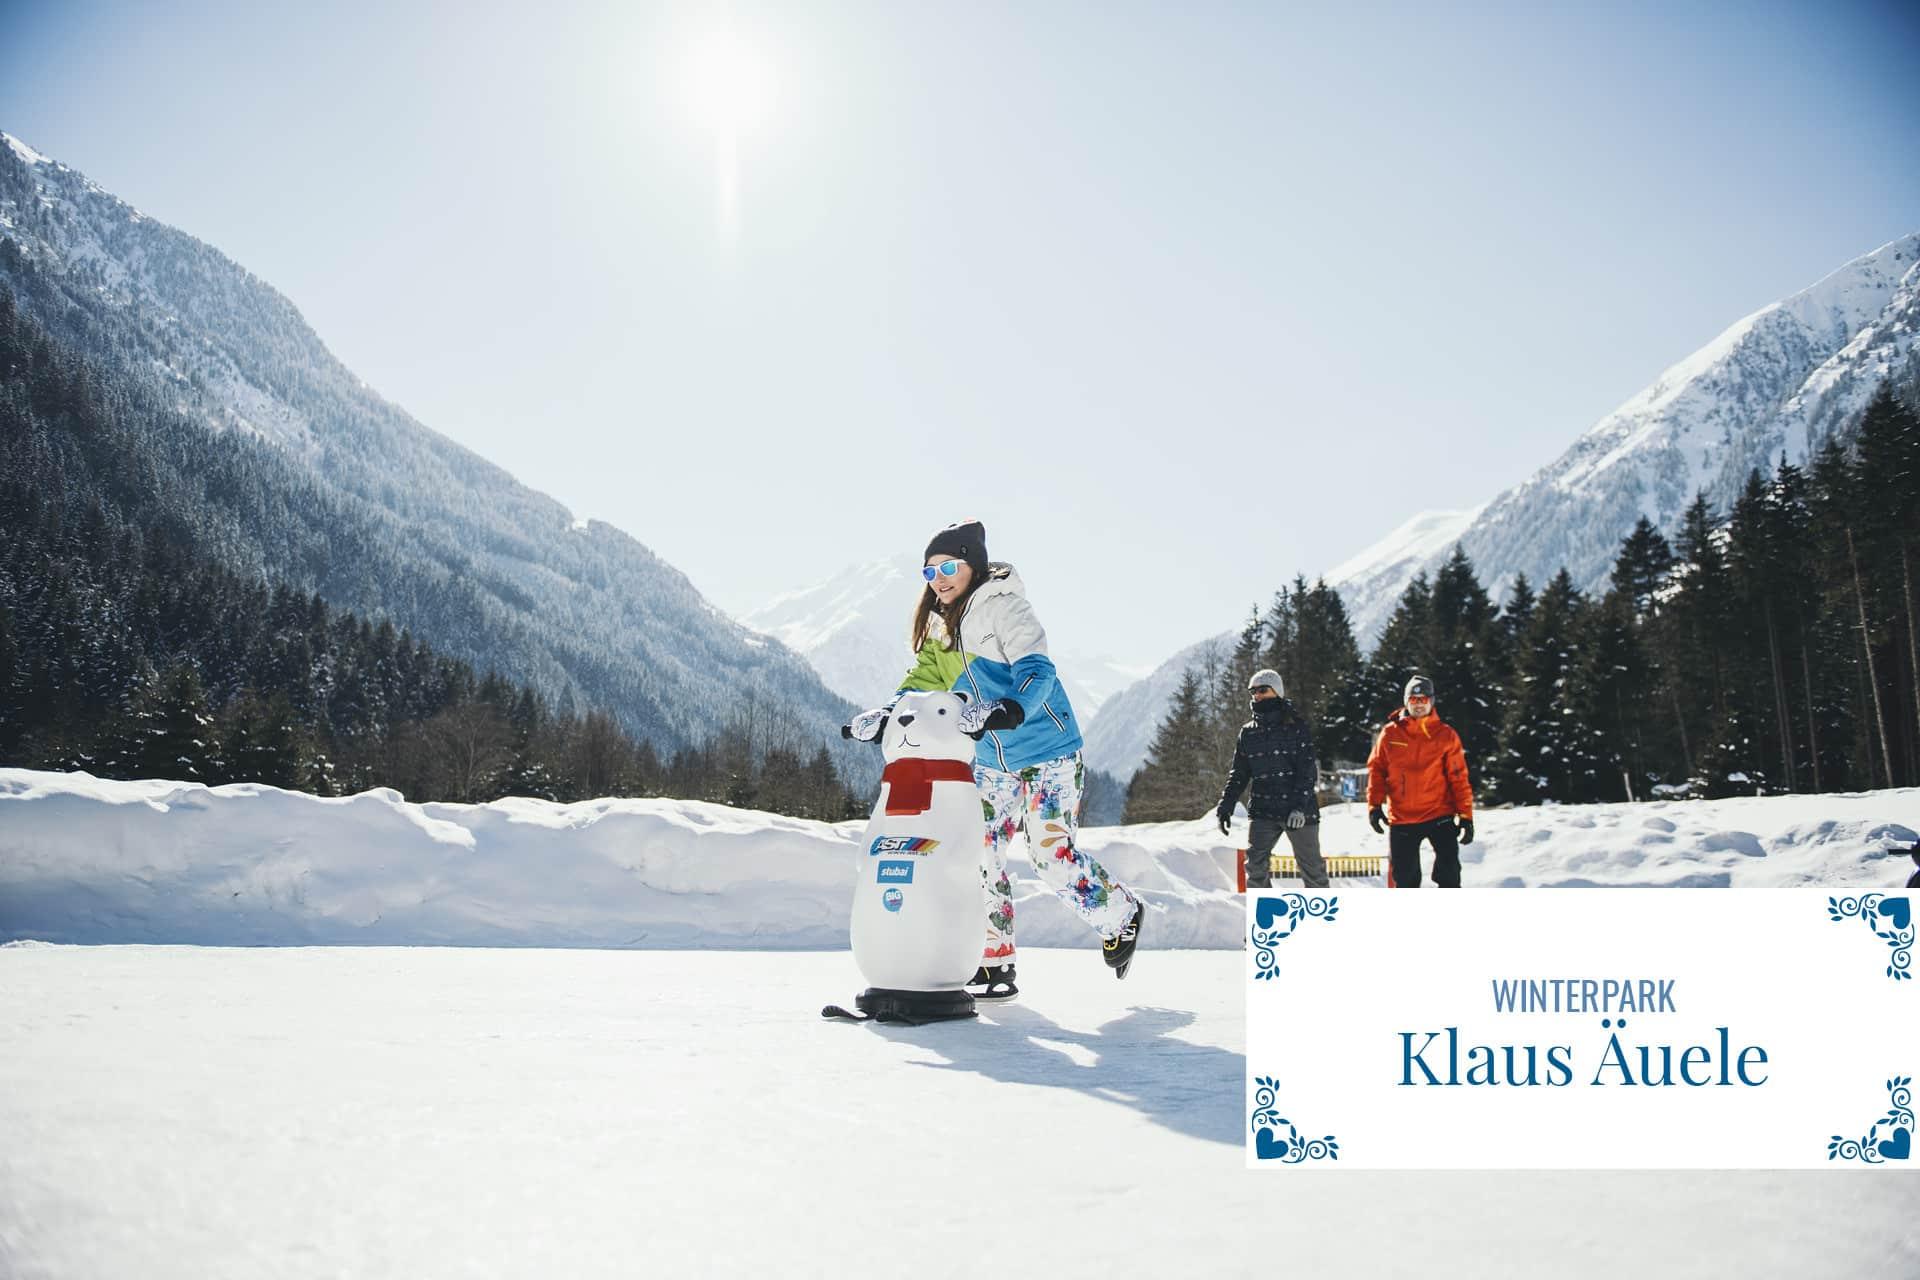 Sepp-und-Hannis-Stubaital-Winterhighlight-Winterpark-Klaus-Aeuele-eislaufen-Aktivurlaub-Tirol